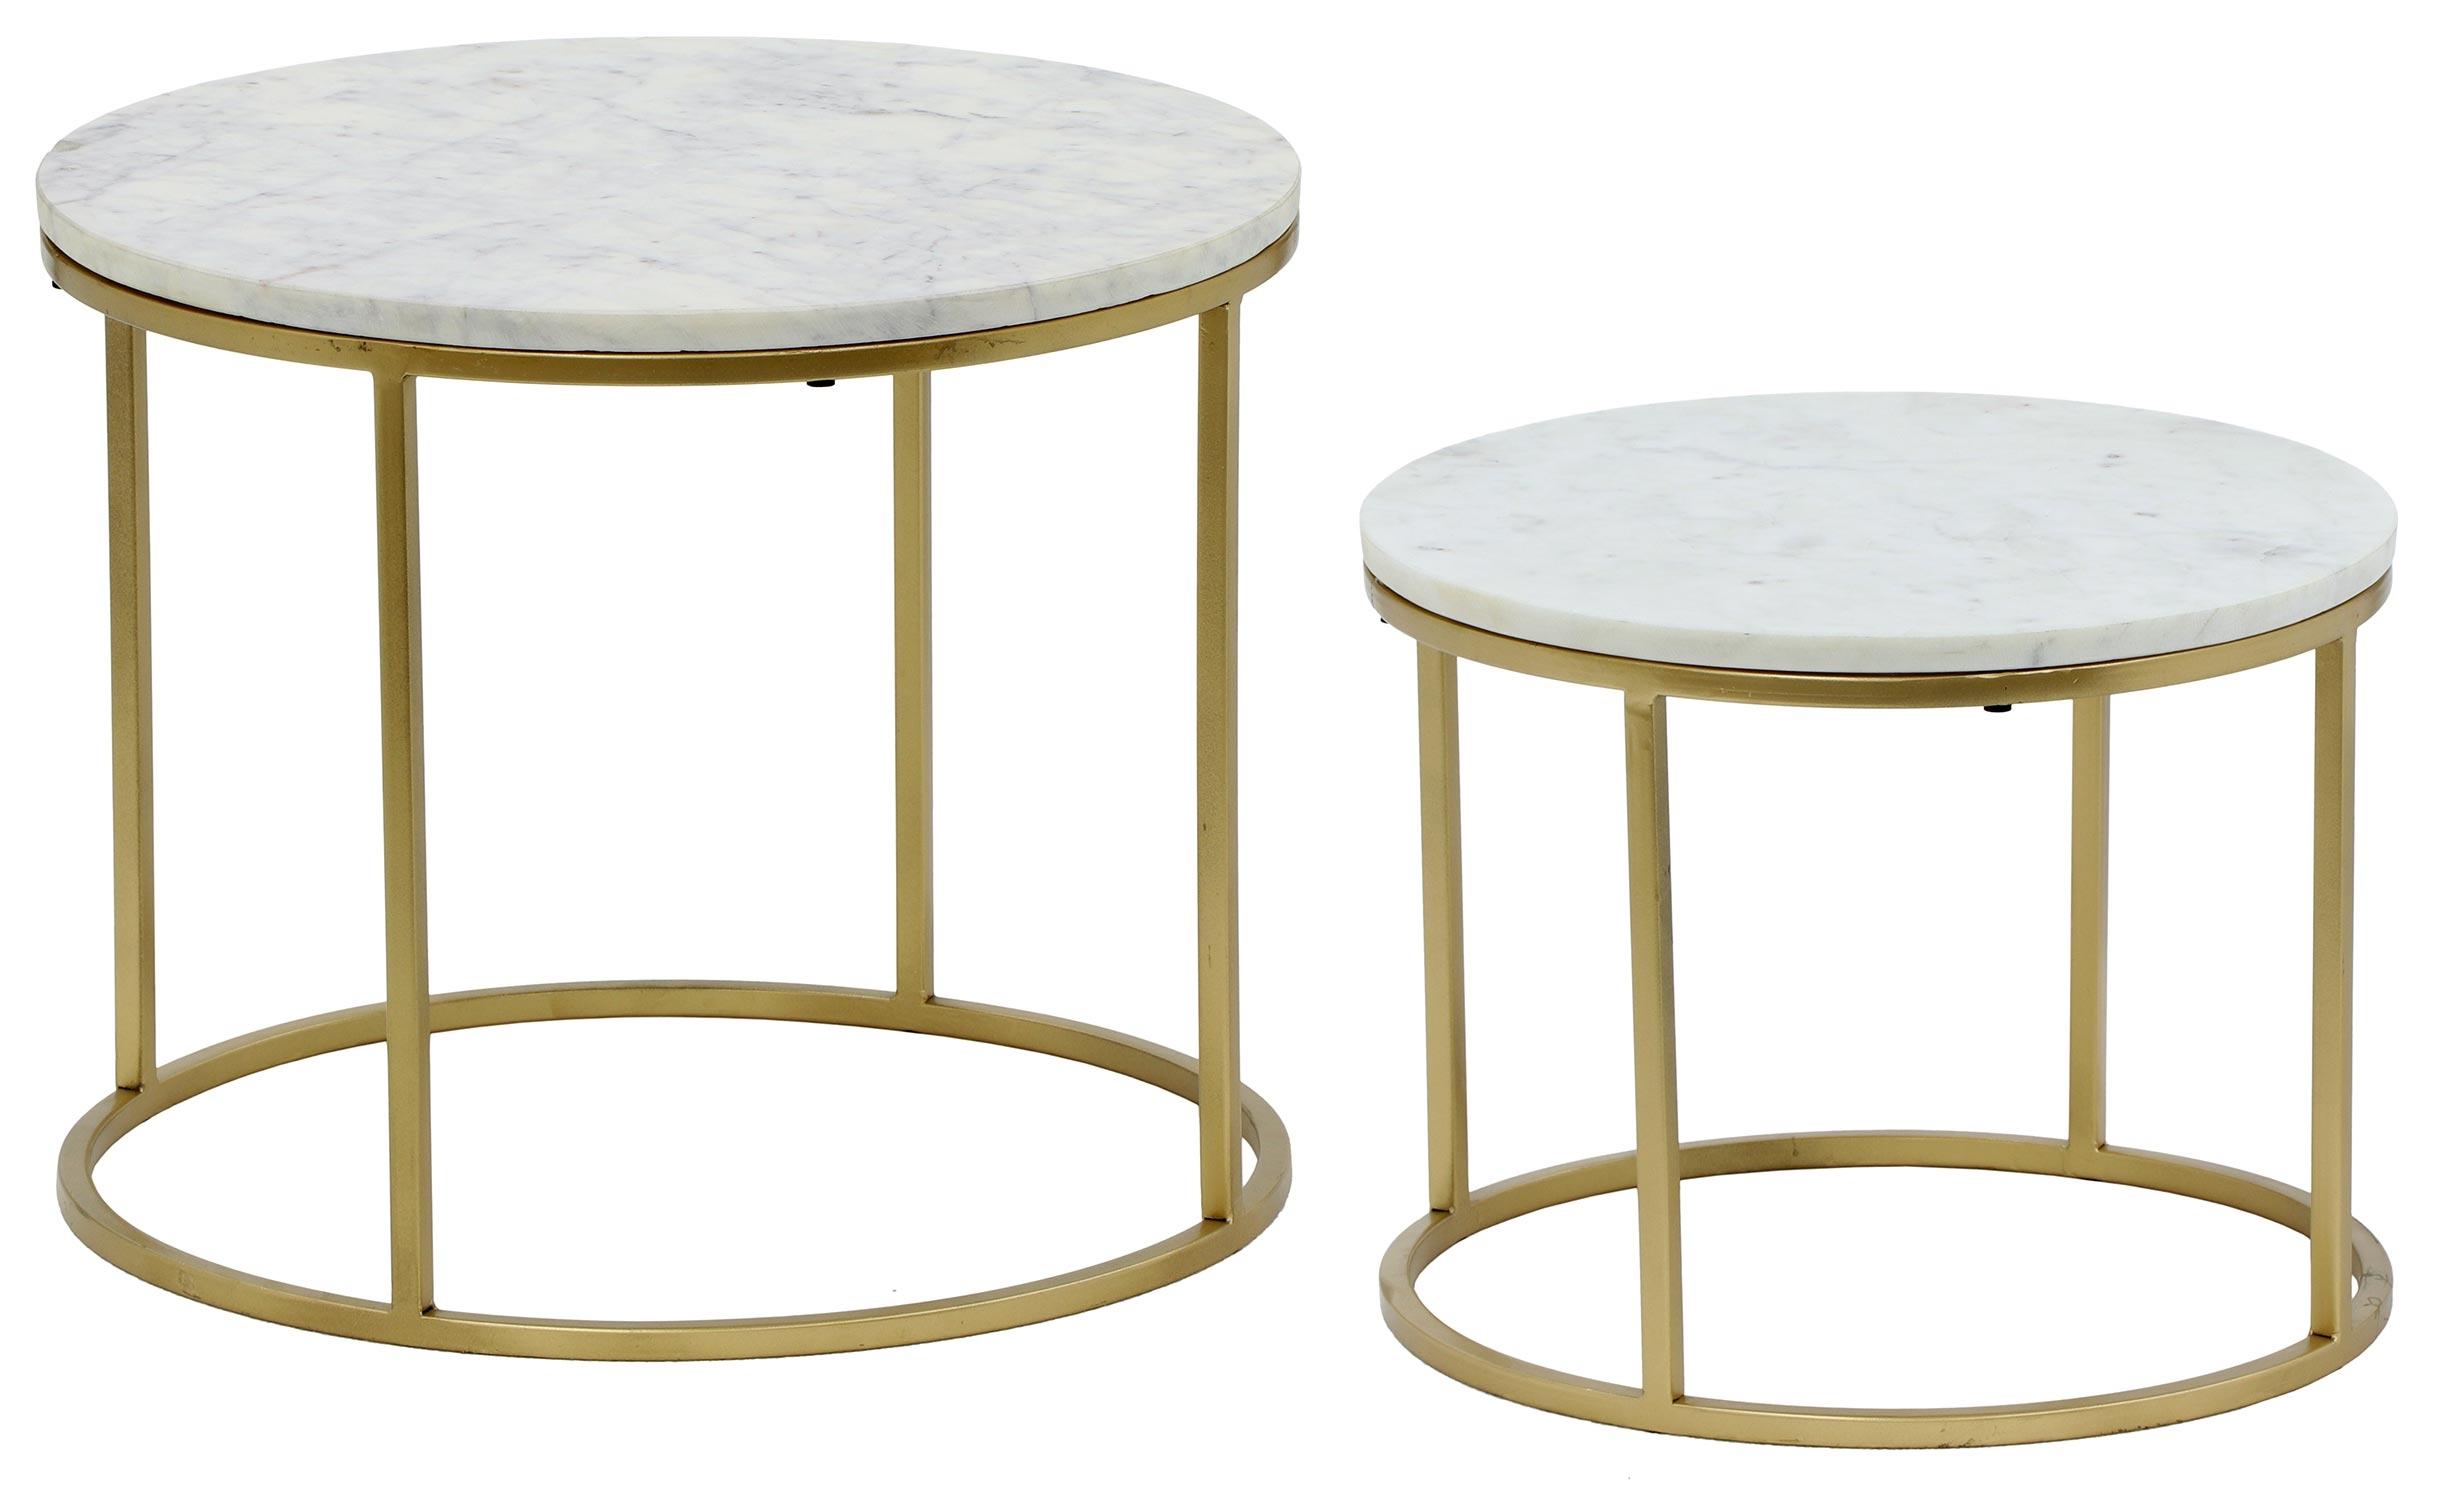 Ensemble de 2 tables basses Artik Marbre et Métal Or